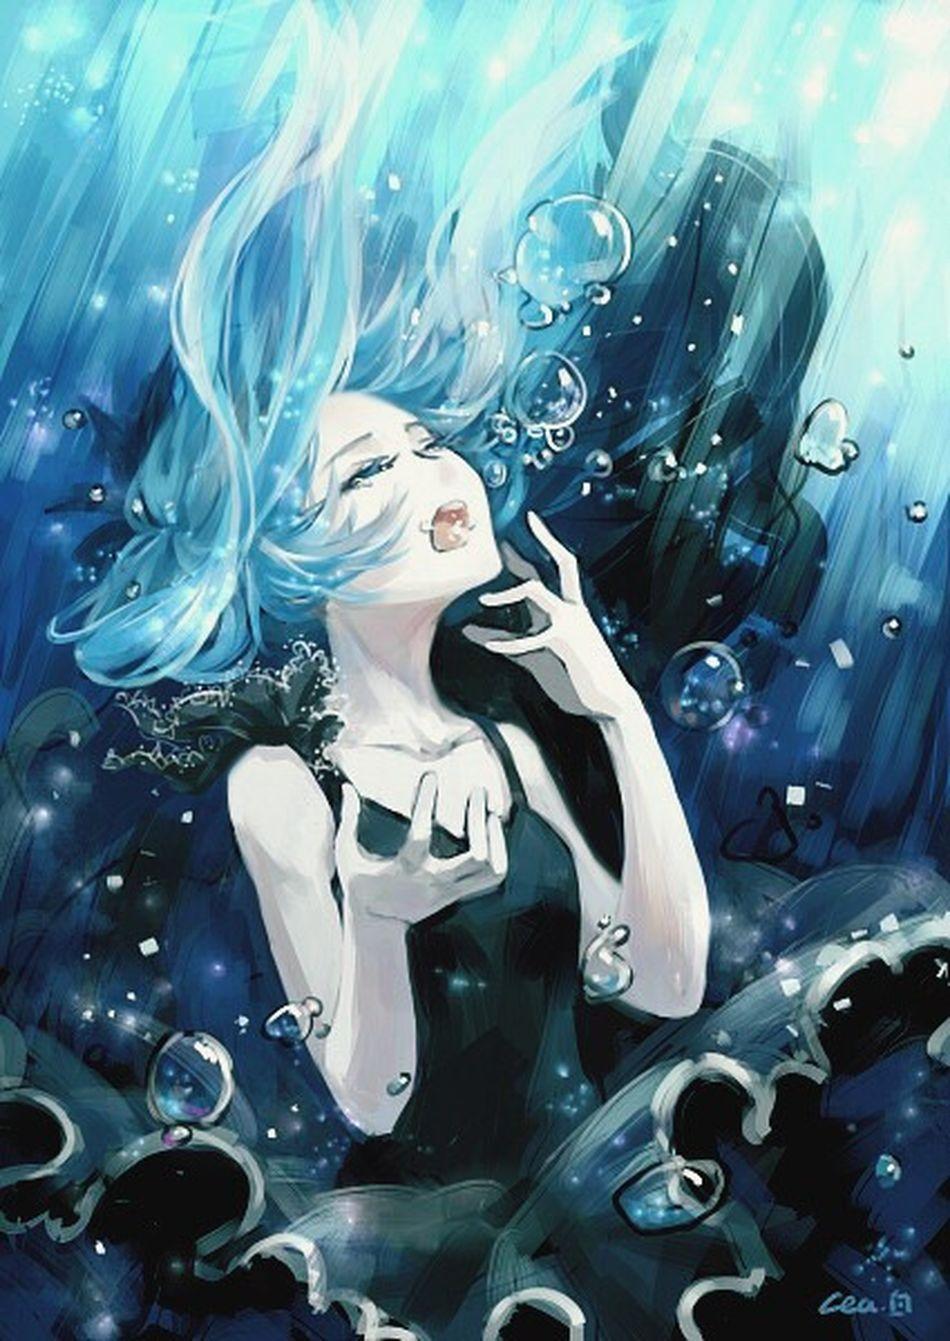 Vocaloid Mikuhatsune Art Anime Sea Deep Sea Girl Meer аниме Море море👻🌊